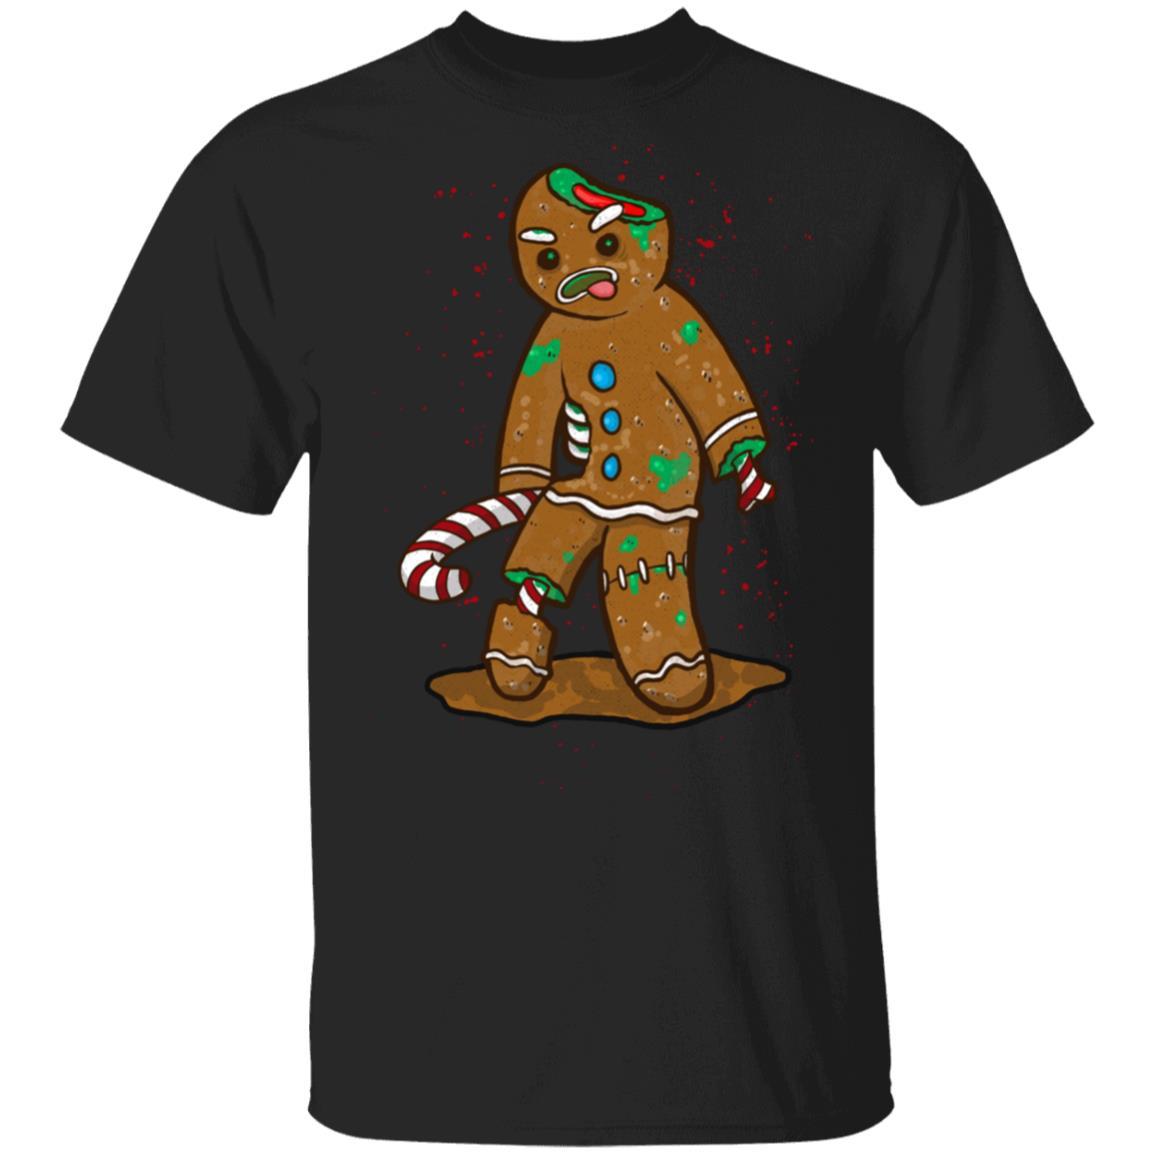 Zombie Gingerbread Man Funny Christmas Baking Unisex Short Sleeve